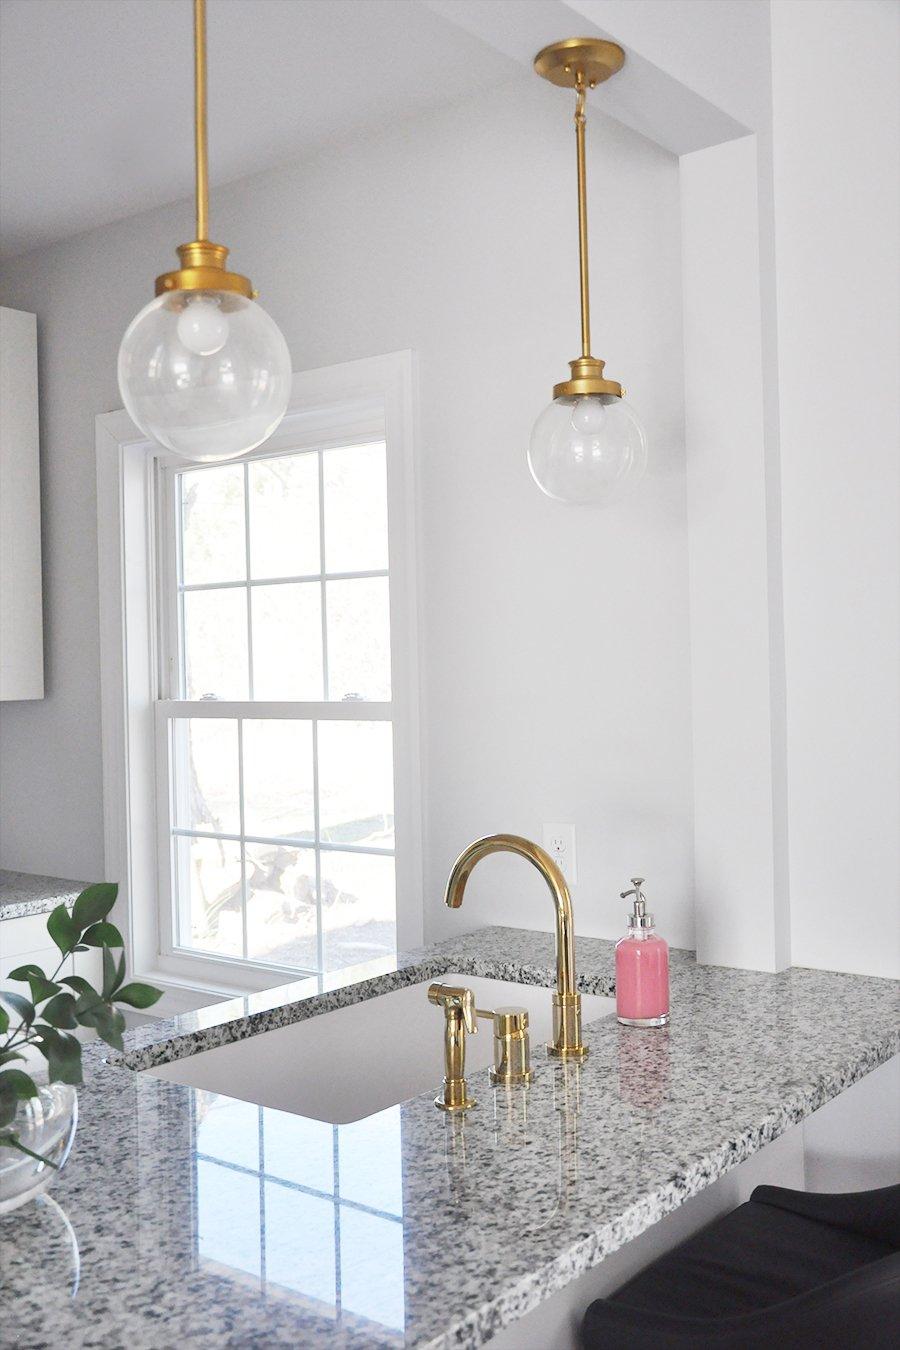 making the case for white undermount kitchen sinks white kitchen sink undermount Making the Case for White Undermount Kitchen Sinks